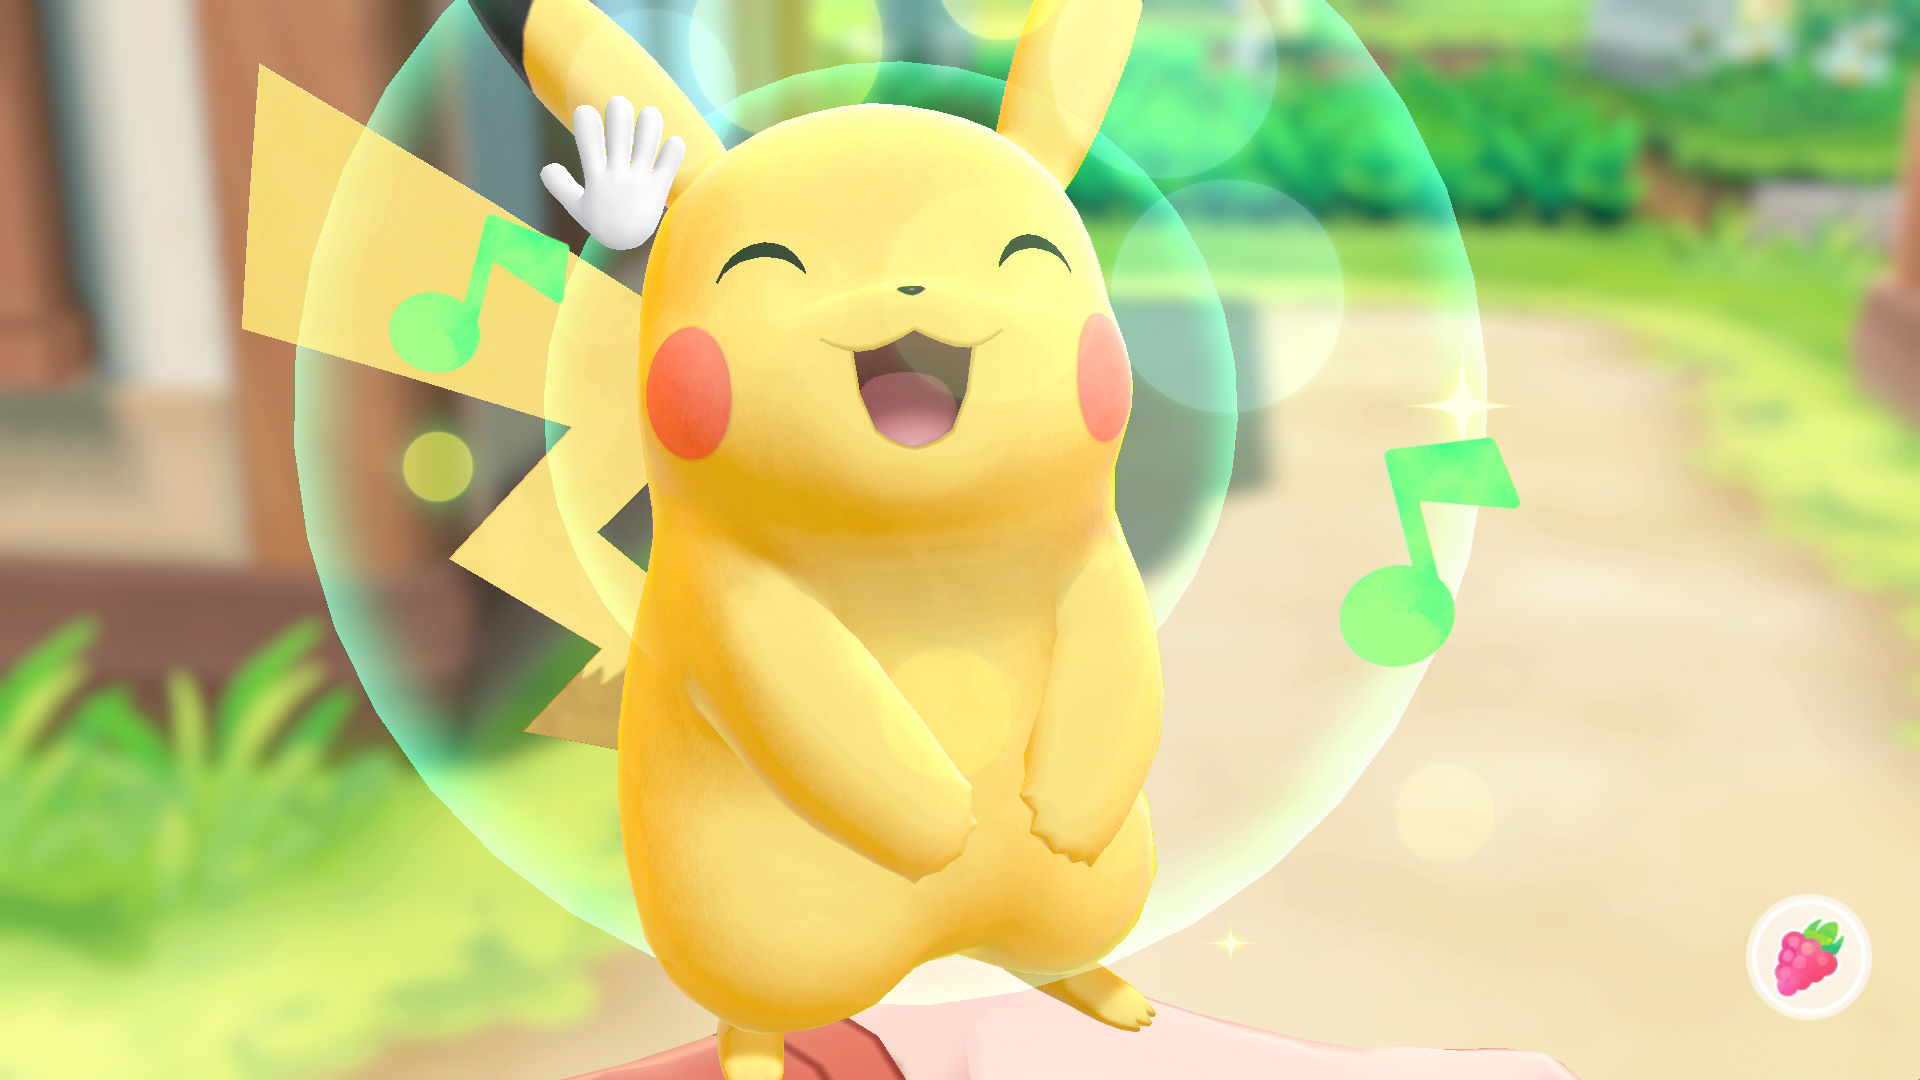 Pokémon: Let's Go, Pikachu! Pokémon: Let's Go, Eevee! Nintendo Switch